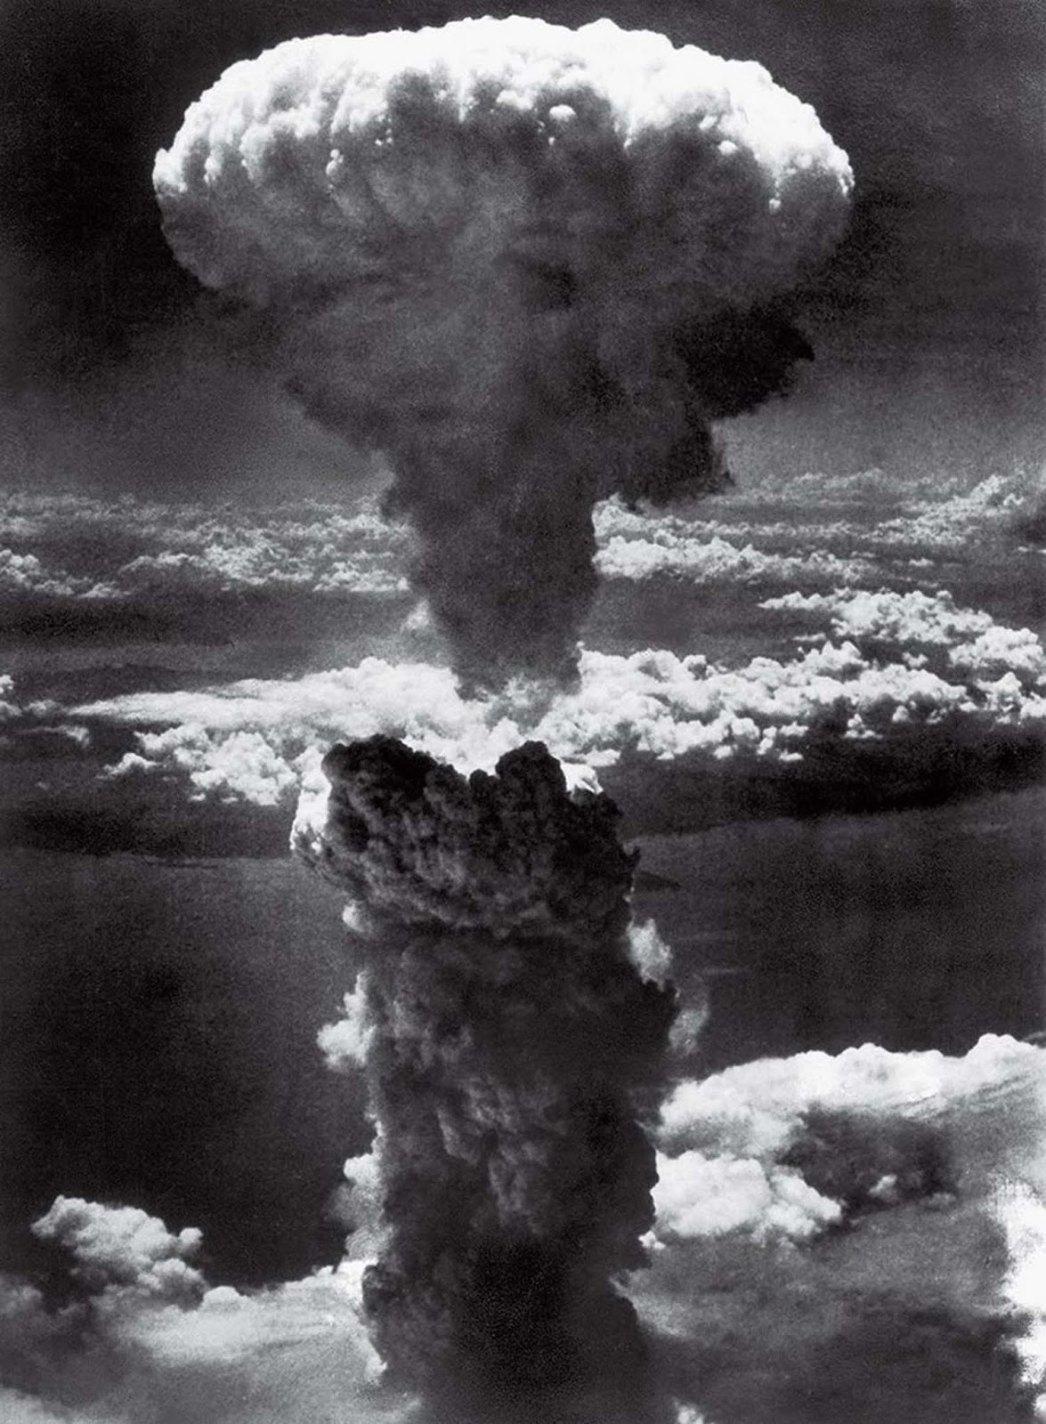 History photo Mushroom Cloud Over Nagasaki, Lieutenant Charles Levy, 1945